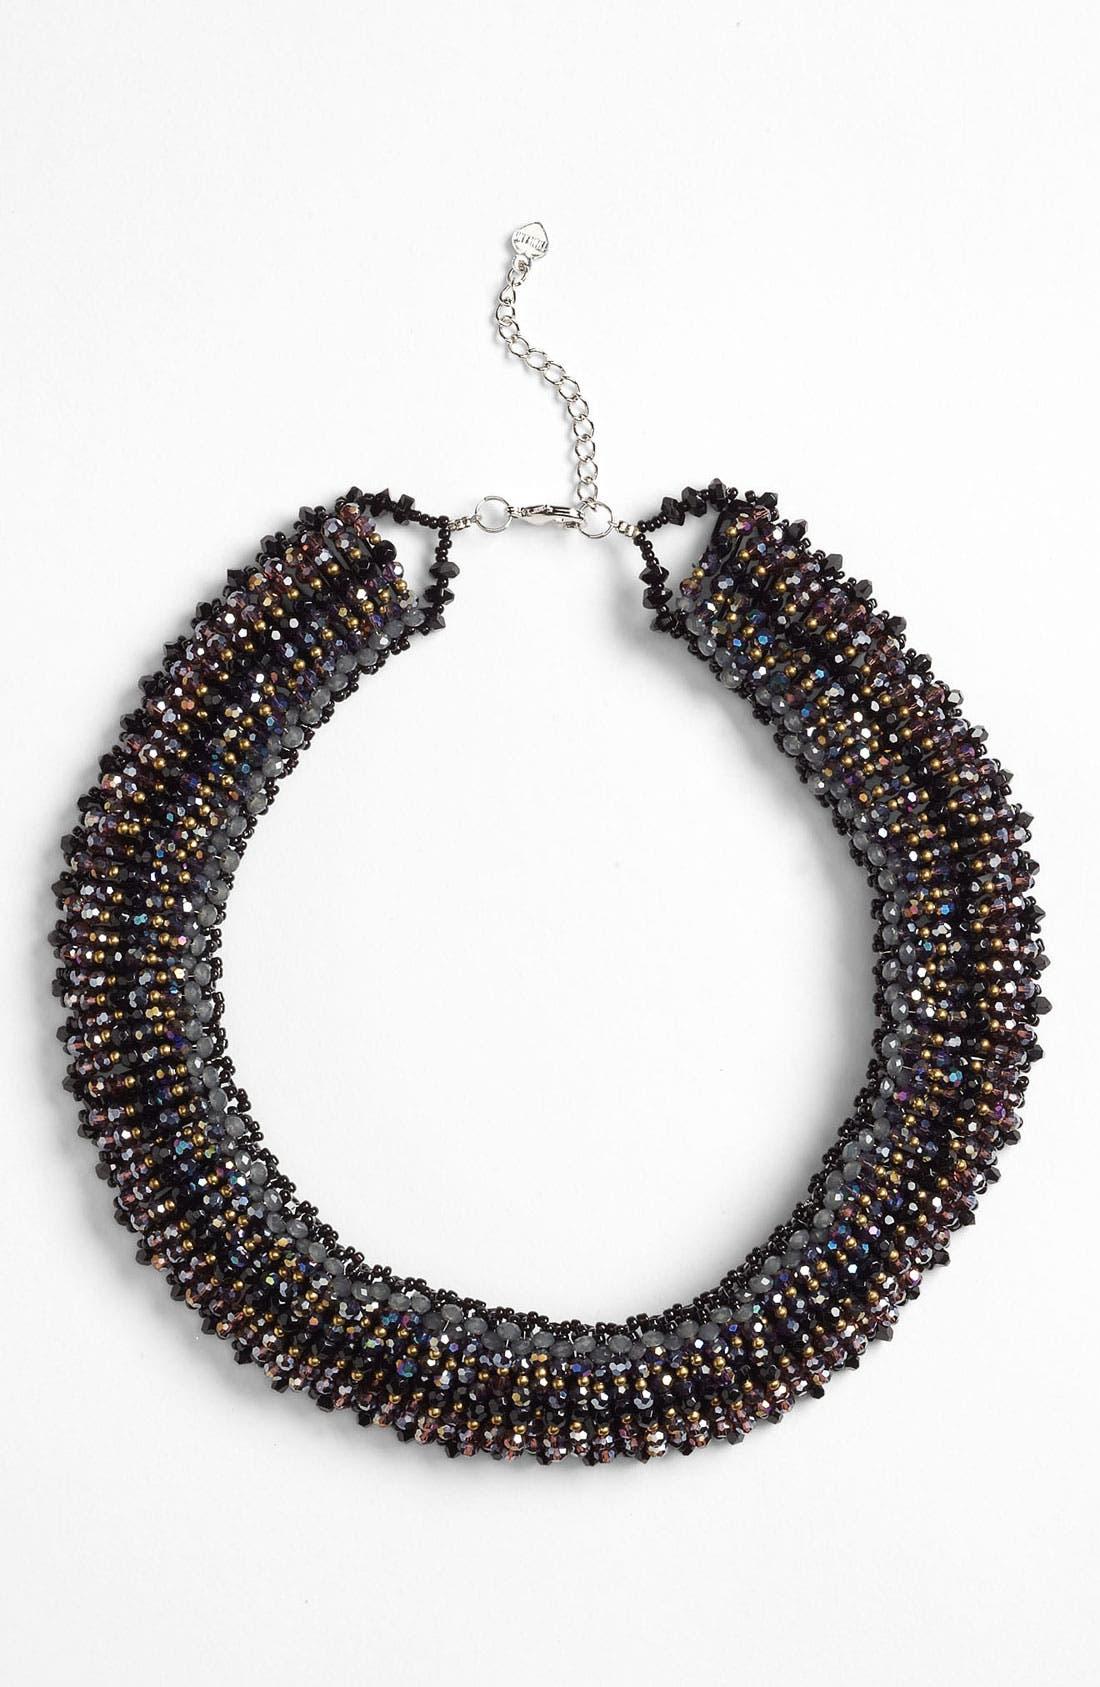 Main Image - Nakamol Design 'Cleo - Mini' Collar Necklace.